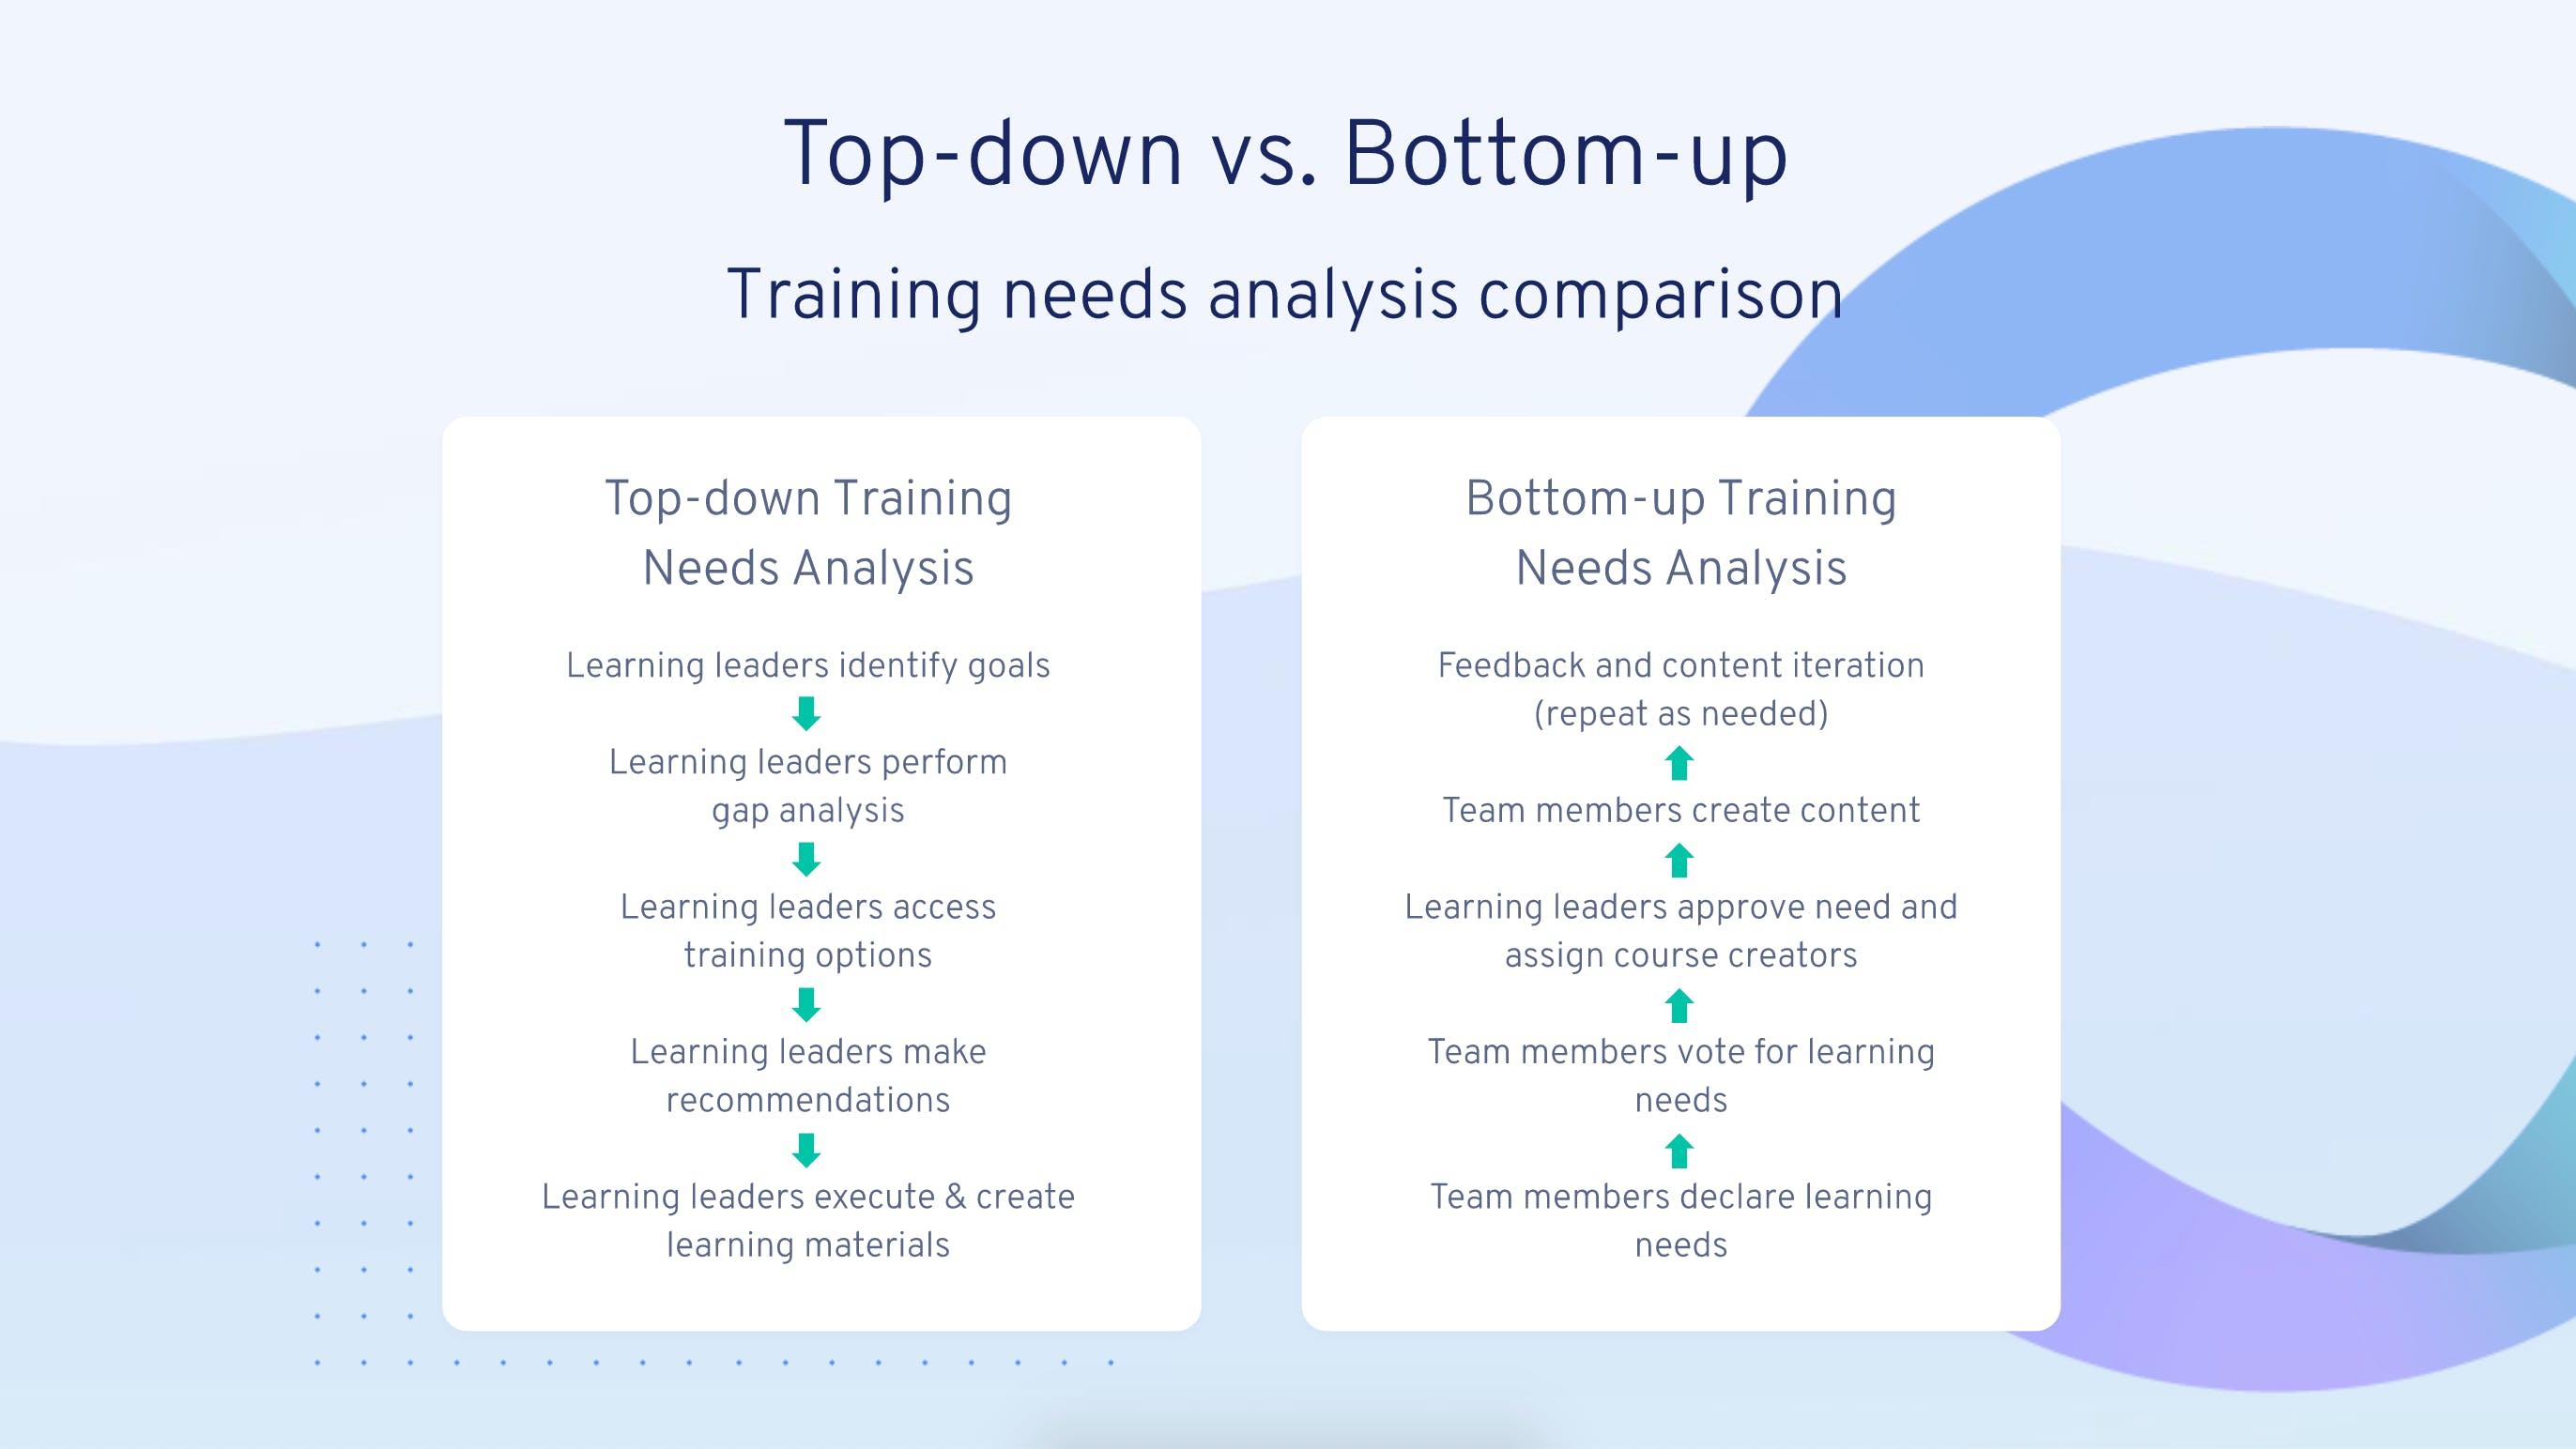 Top-down vs. Bottom-up Training Needs Analysis Comparison